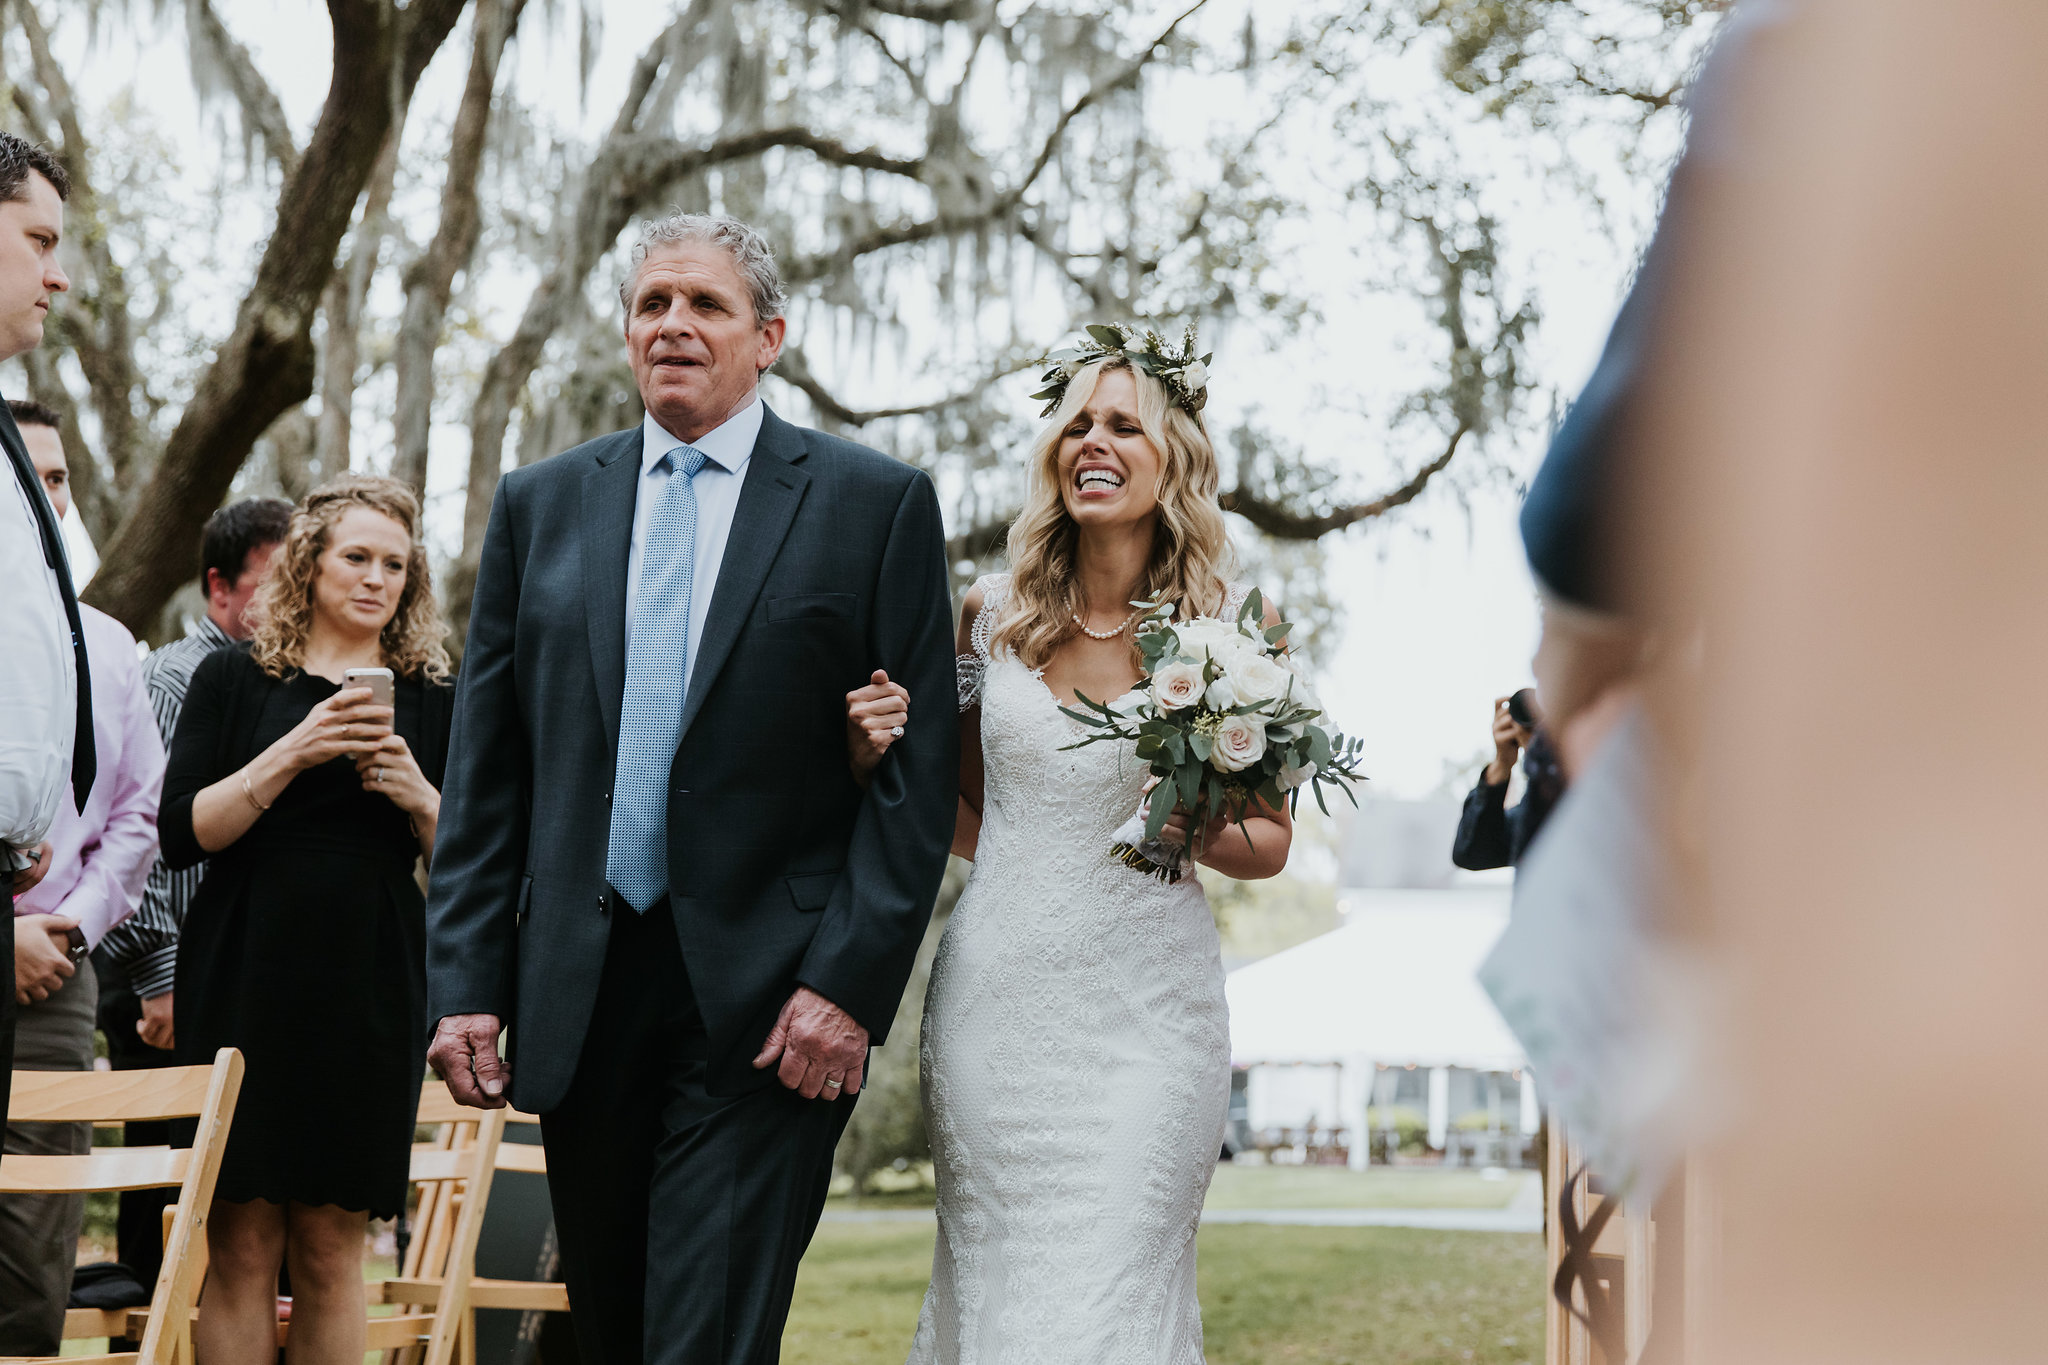 Legare-Waring-House-Charleston-SC-wedding-portrait-photography-126.jpg